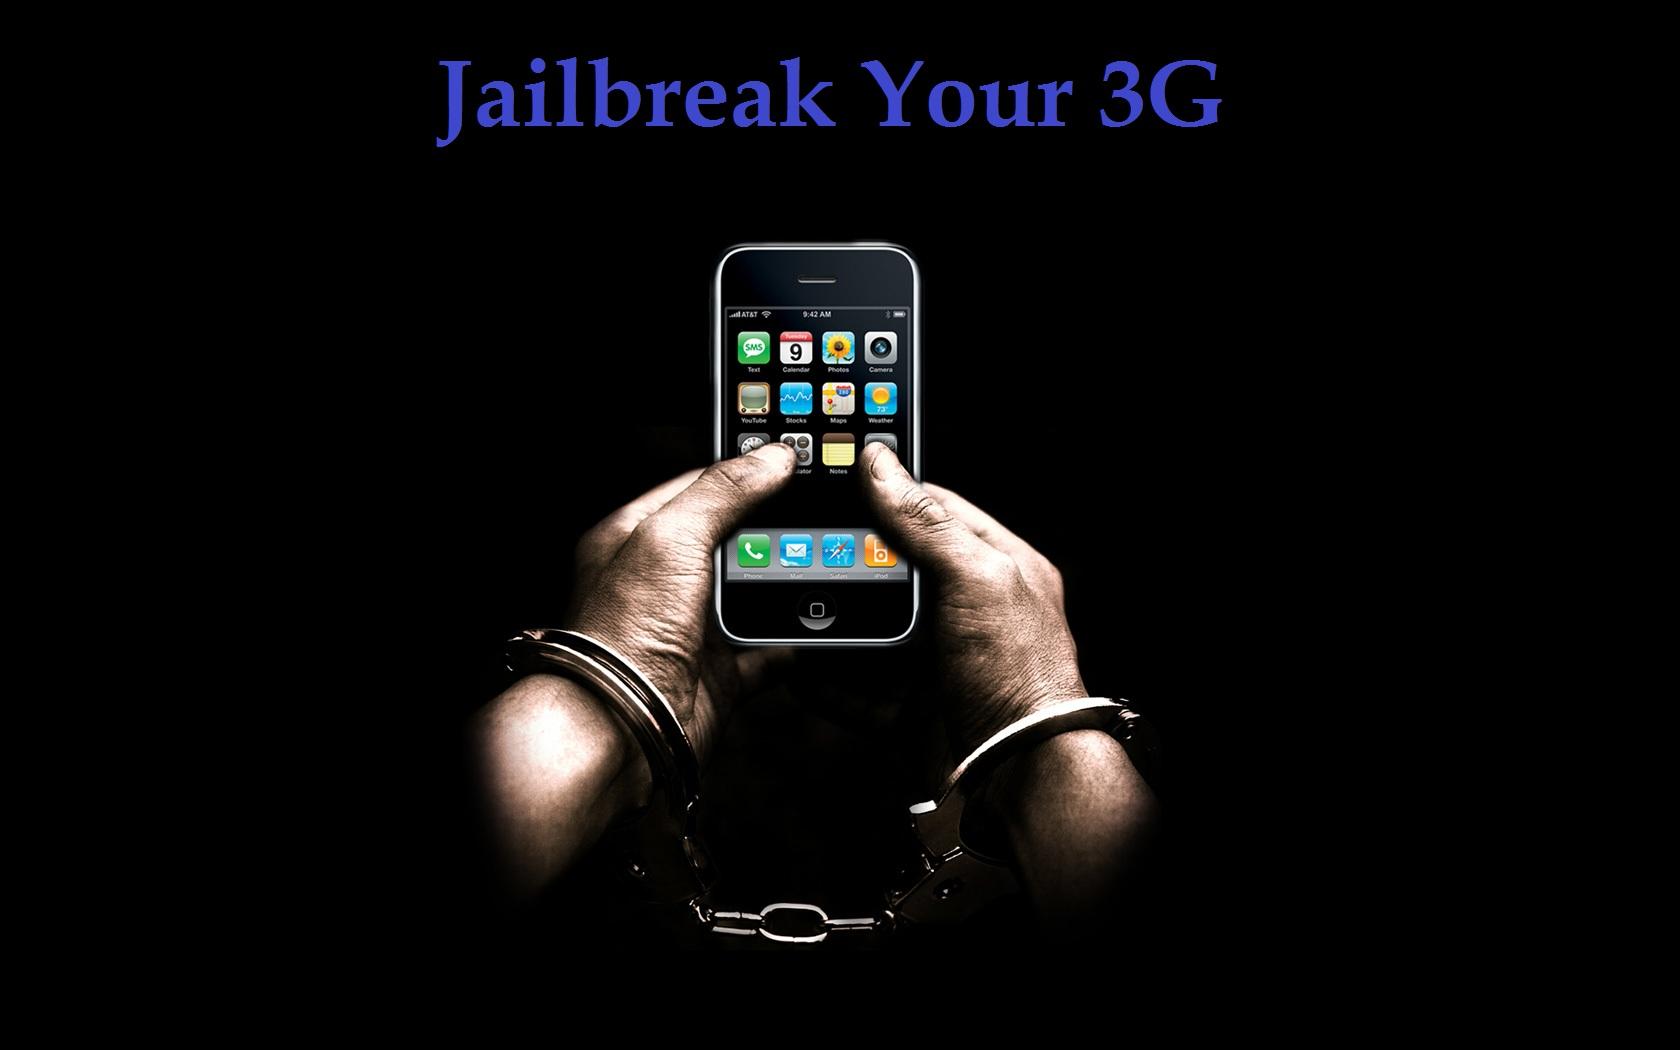 Come fare jailbreak iPhone